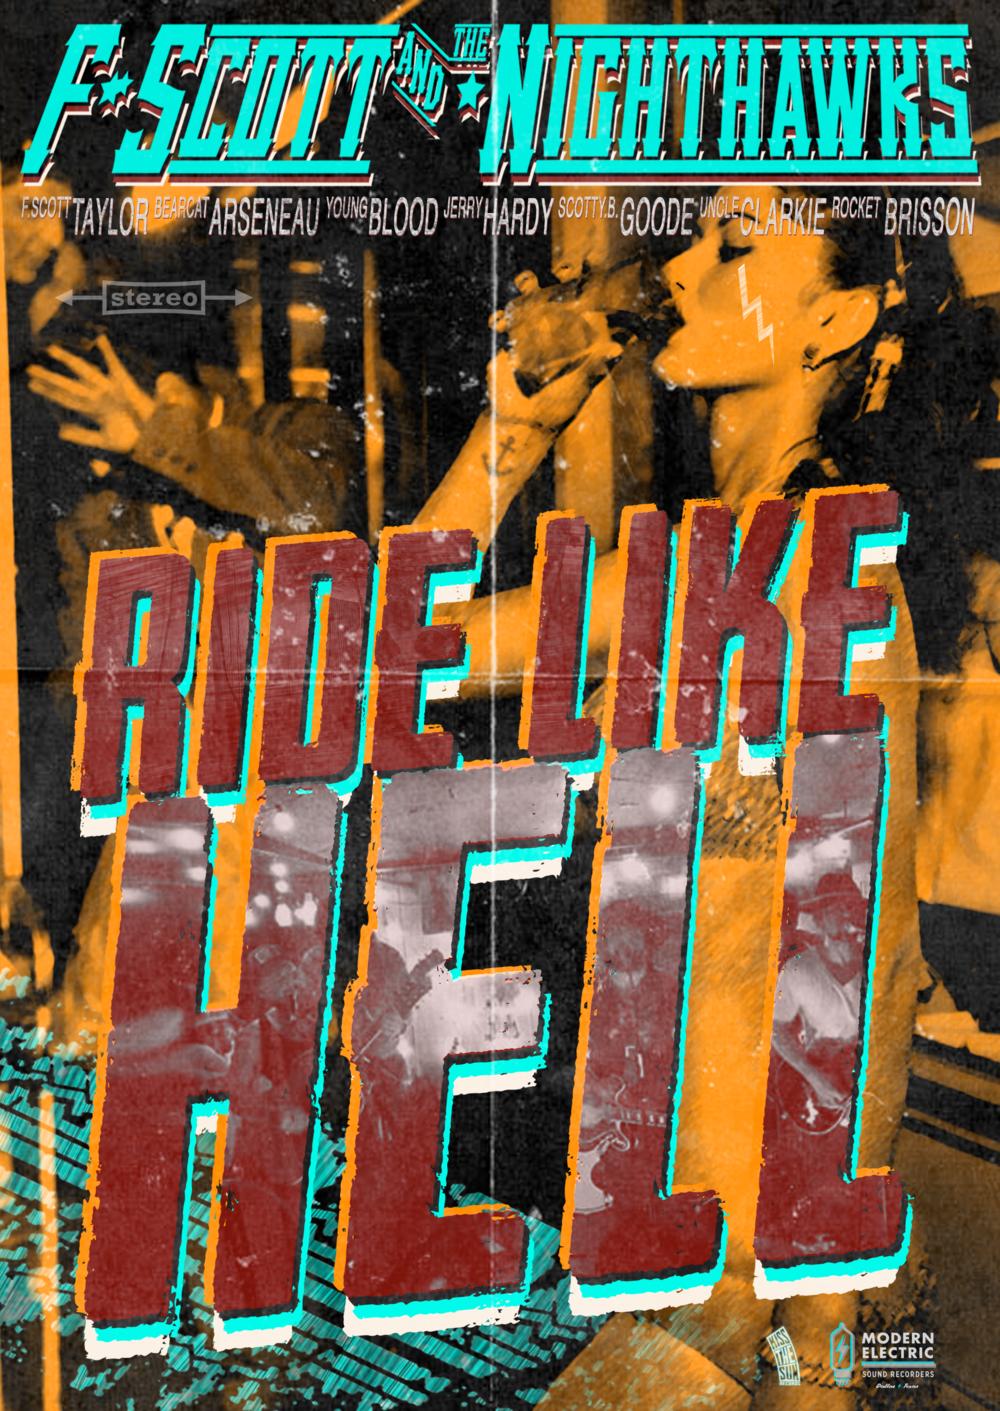 FSCOTT-Ride-Like-Hell.png